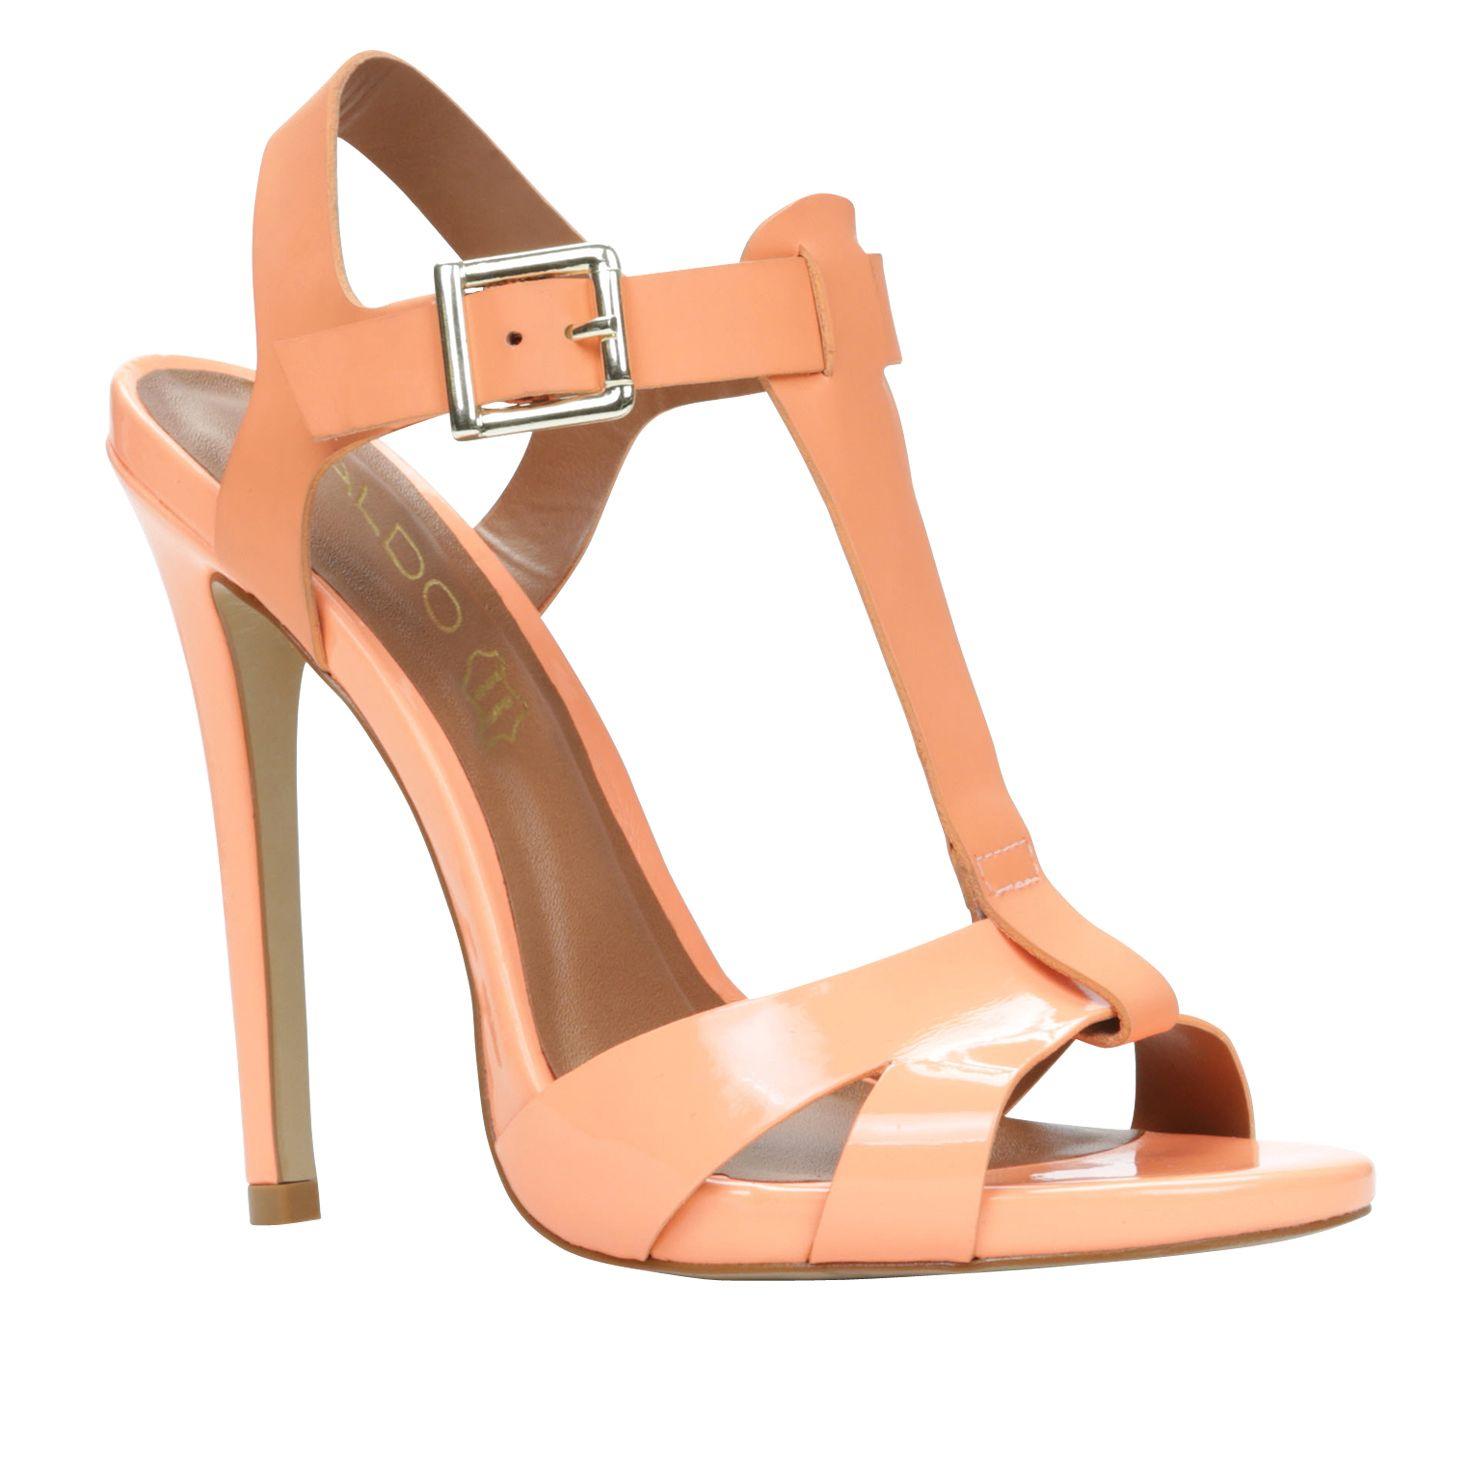 Dolce Vita Shoes High Heels